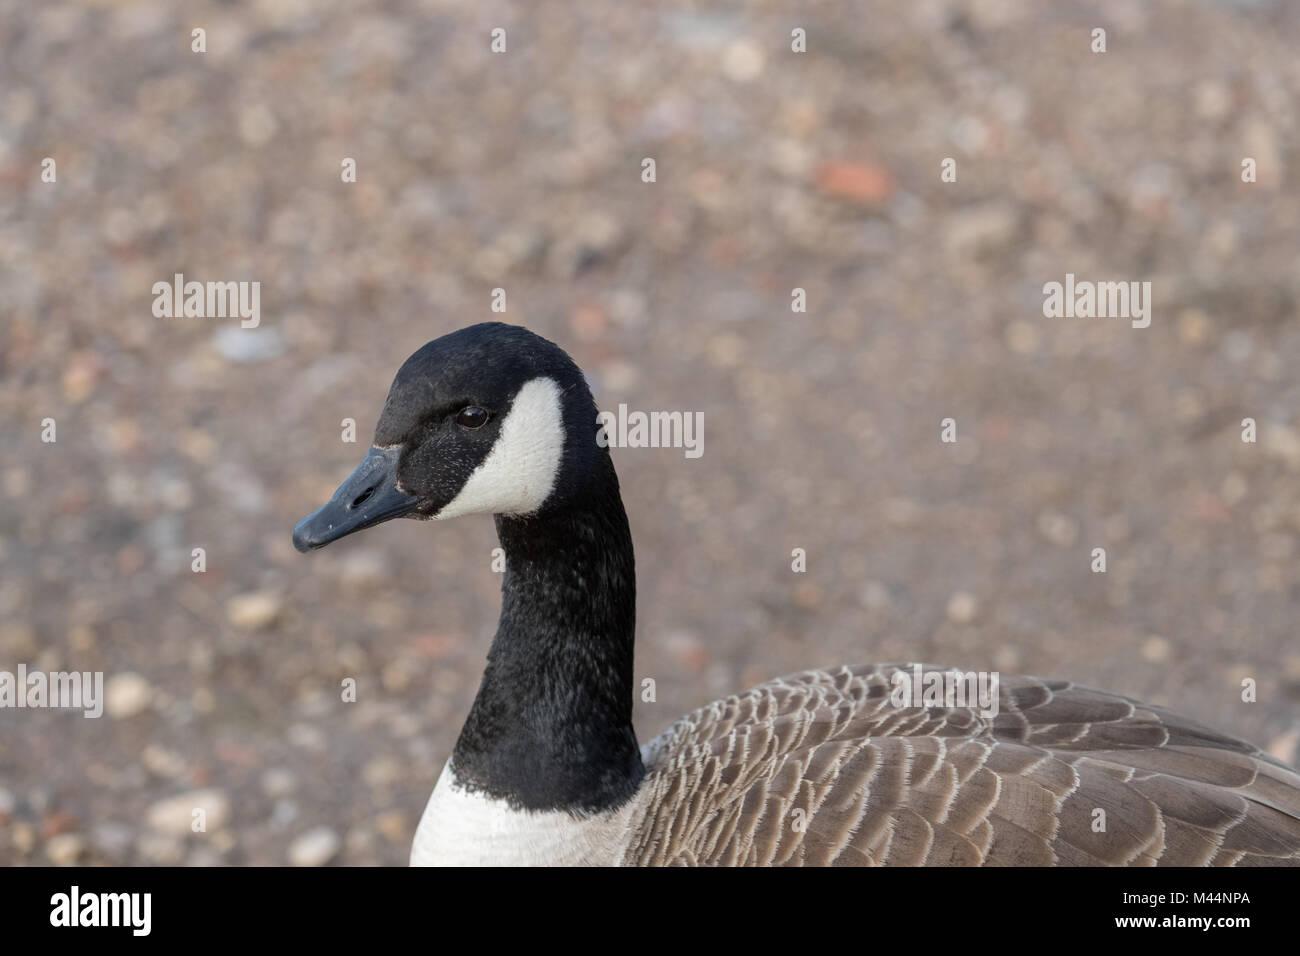 Canada goose head stock photos canada goose head stock images canadian goose branta canadensis on shore close up stock image biocorpaavc